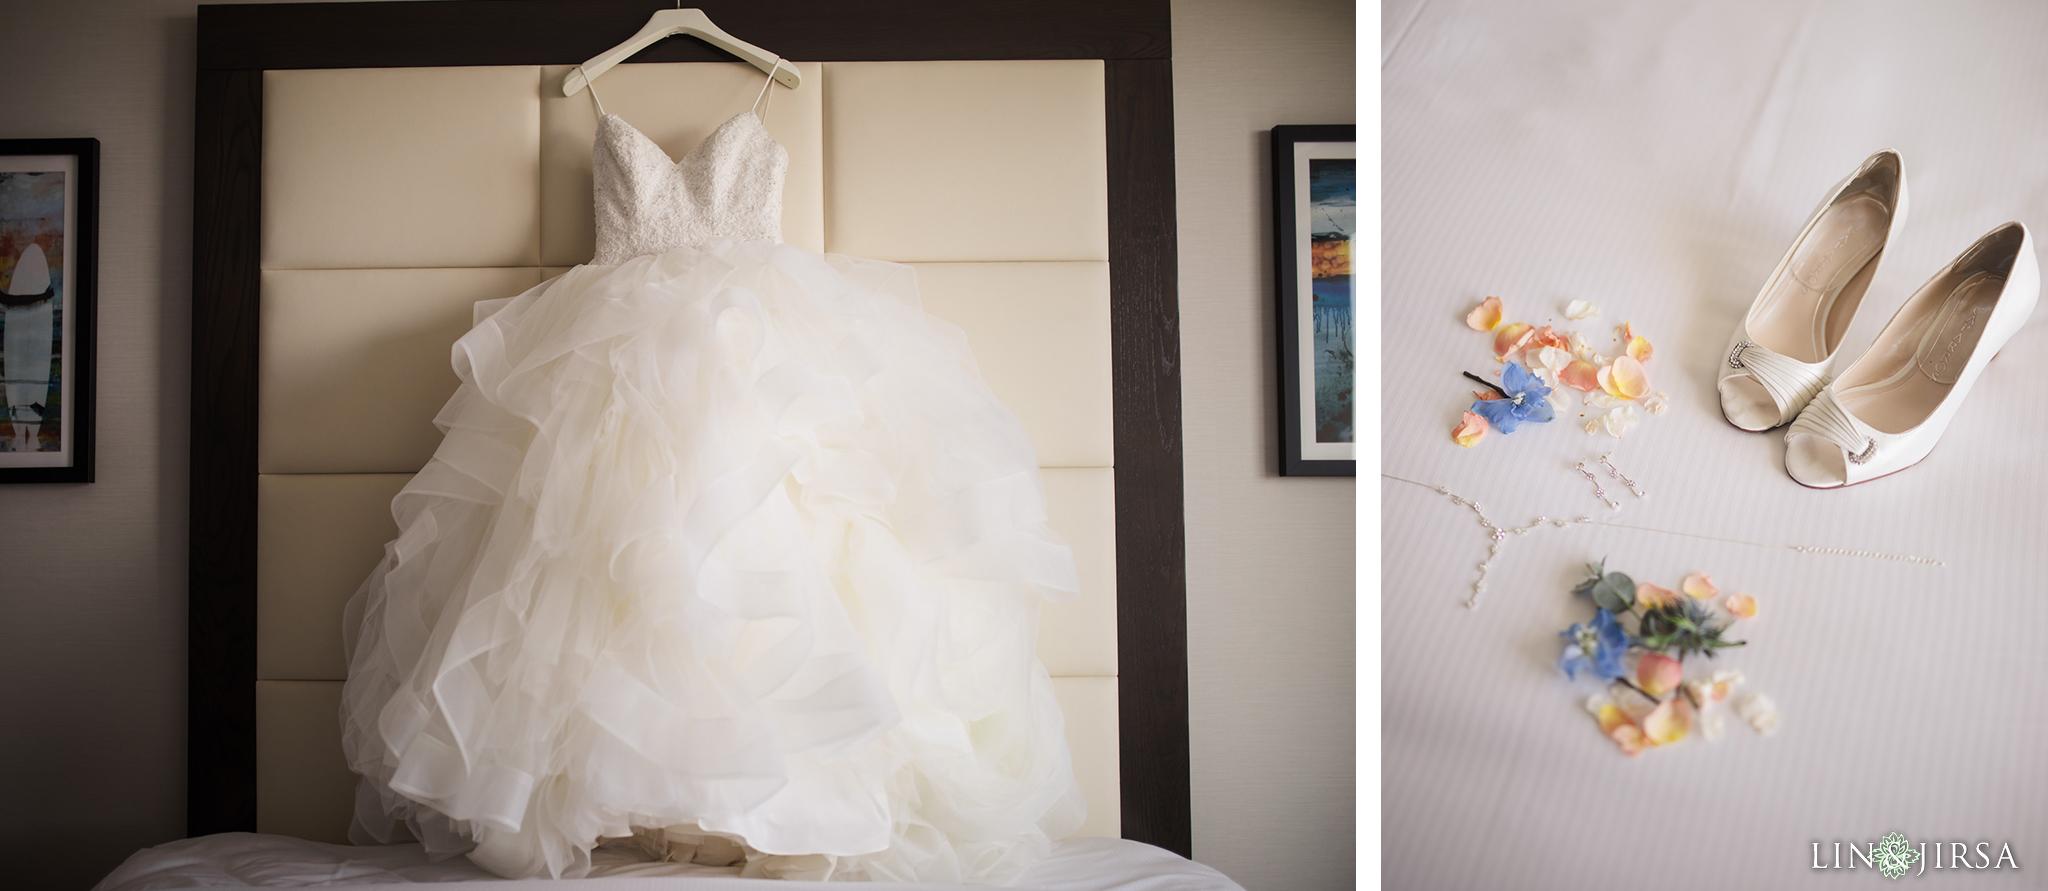 25 The Waterfront Beach Resort Orange County Indian Wedding Photography